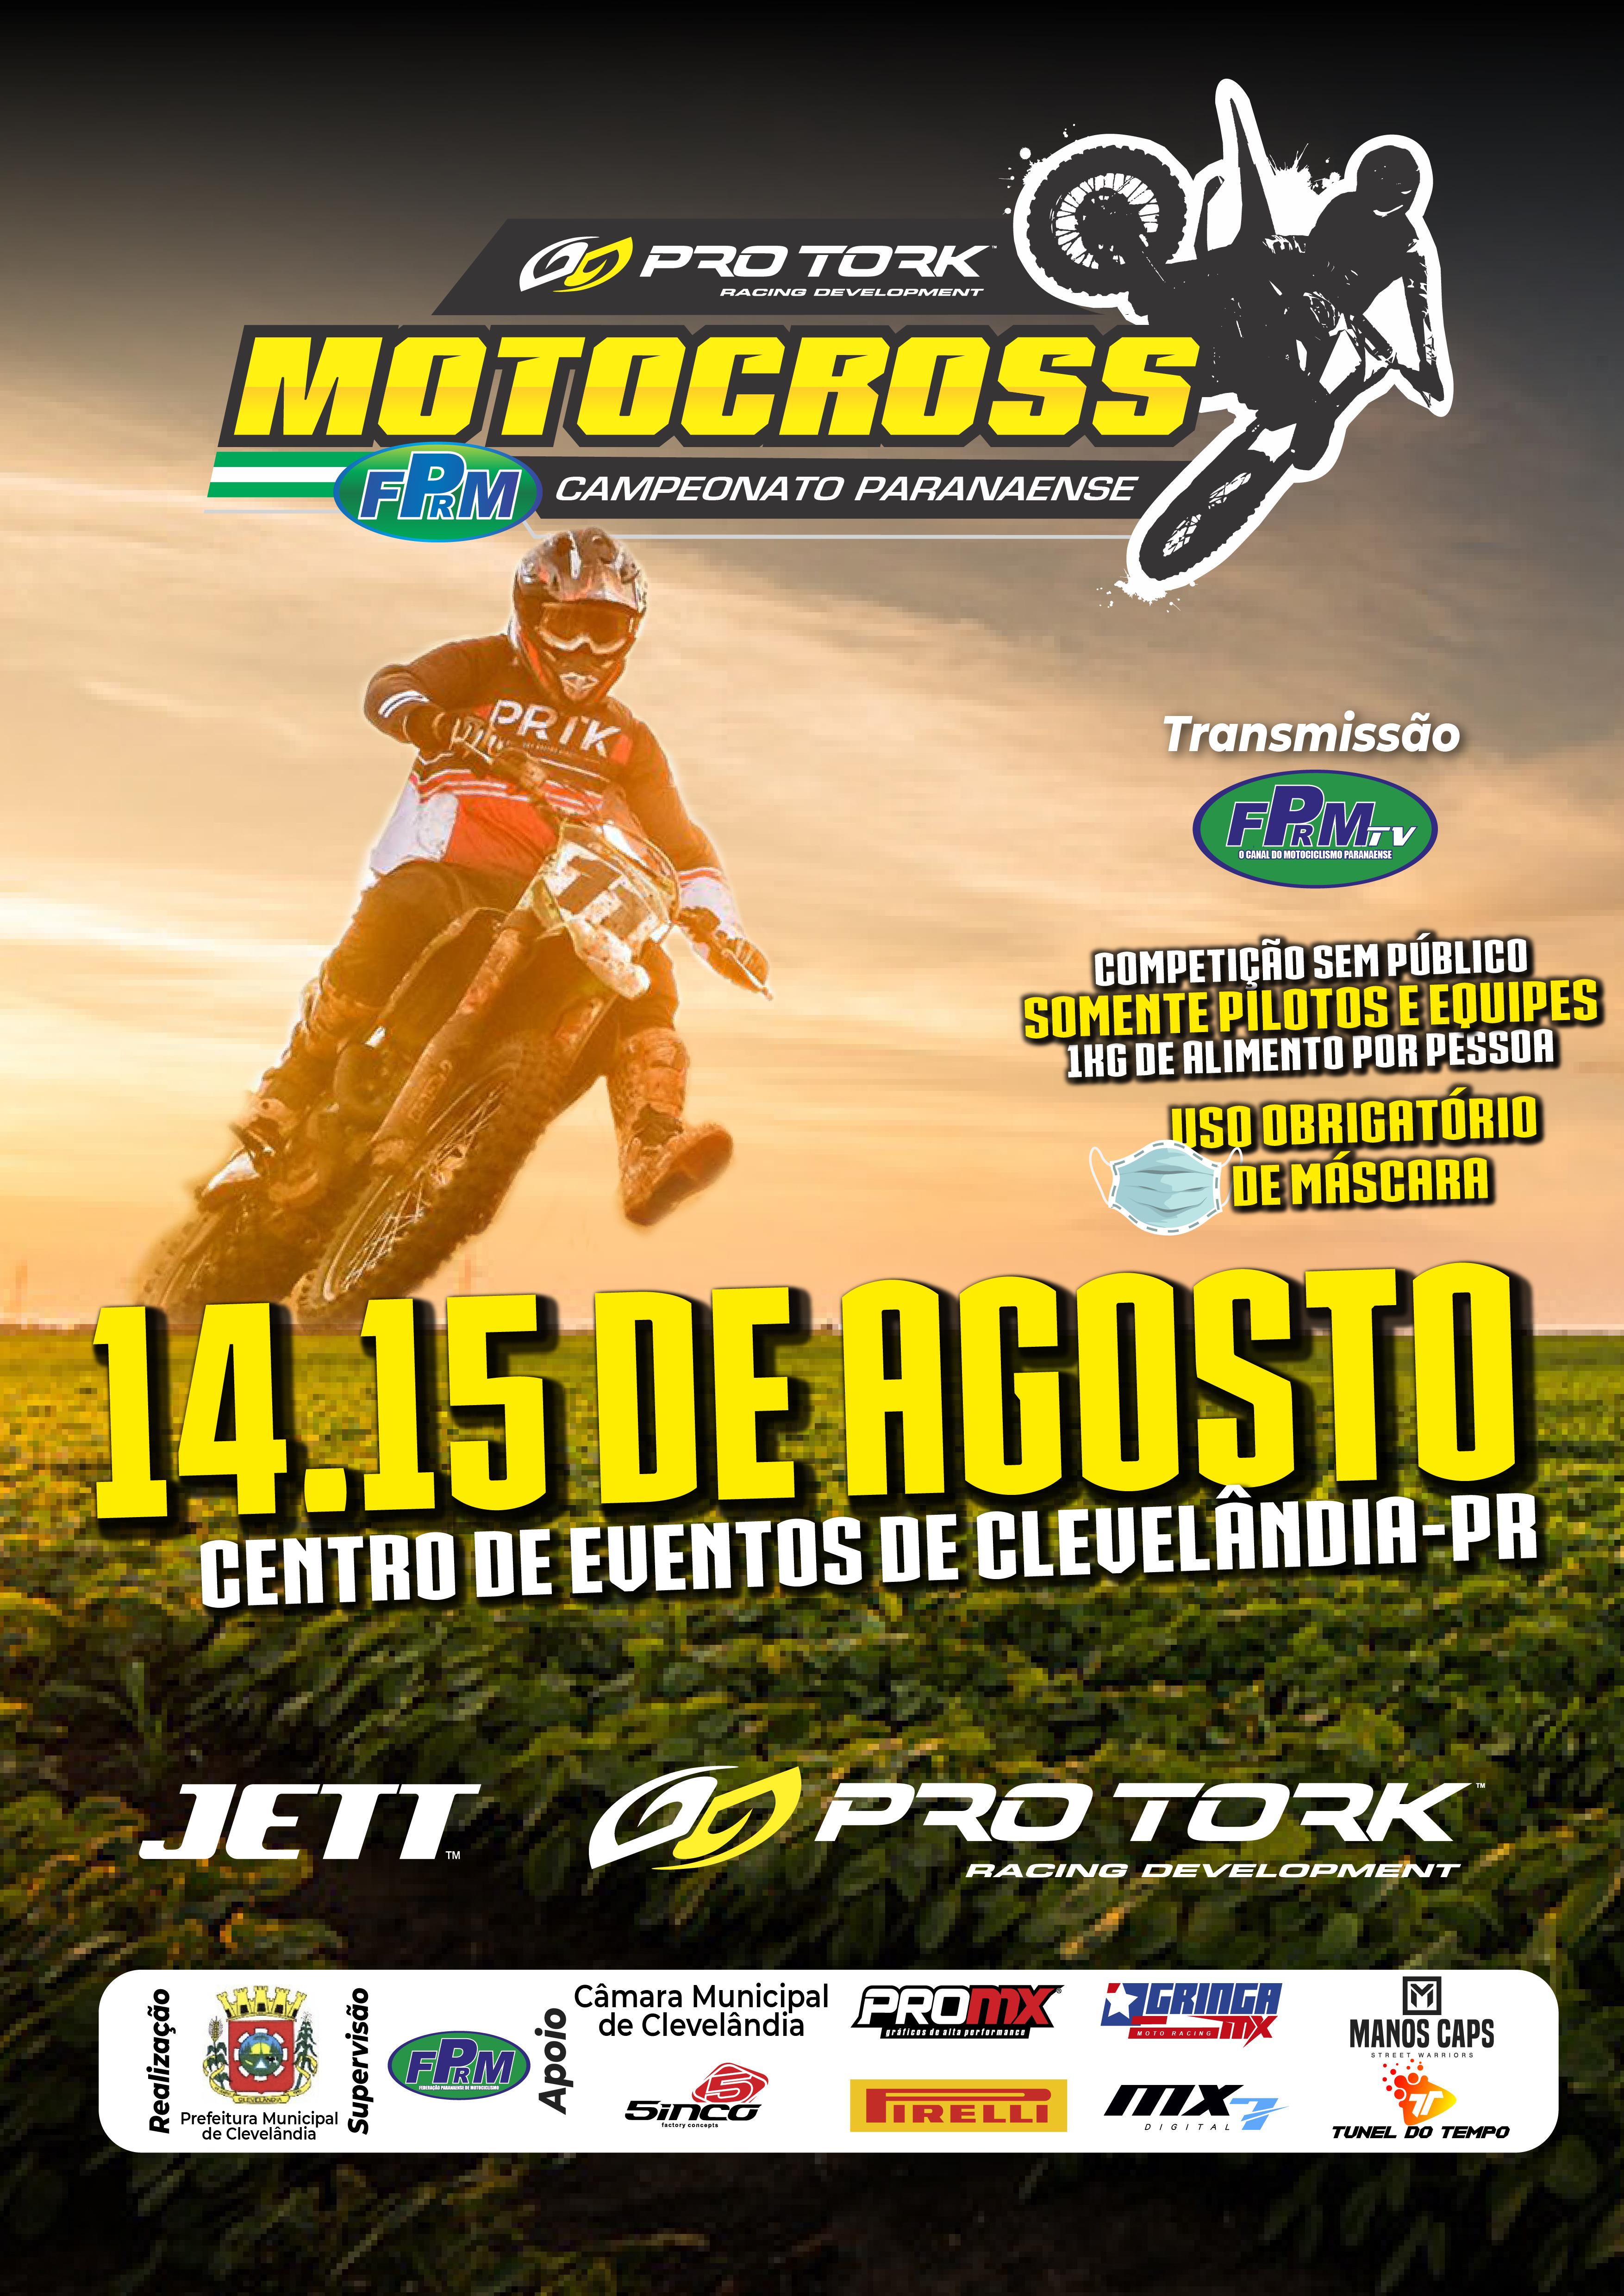 3ª Etapa Campeonato Paranaense de Motocross - Clevelândia